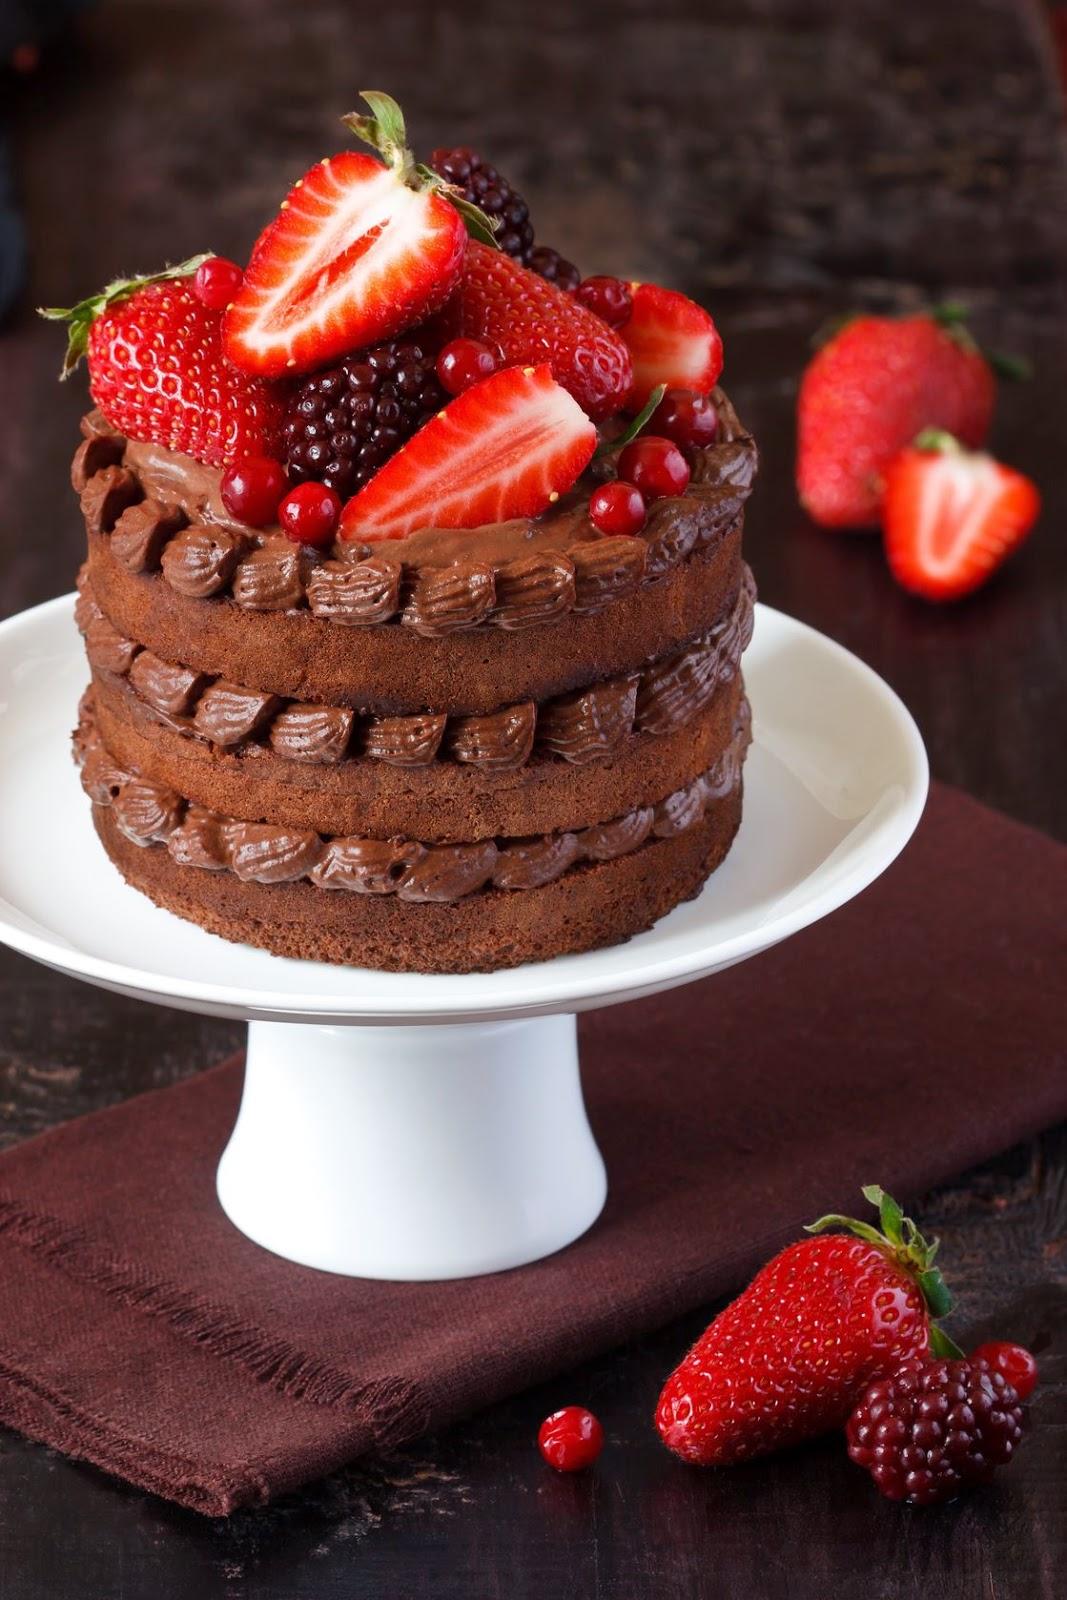 The Best Valentine's Cake